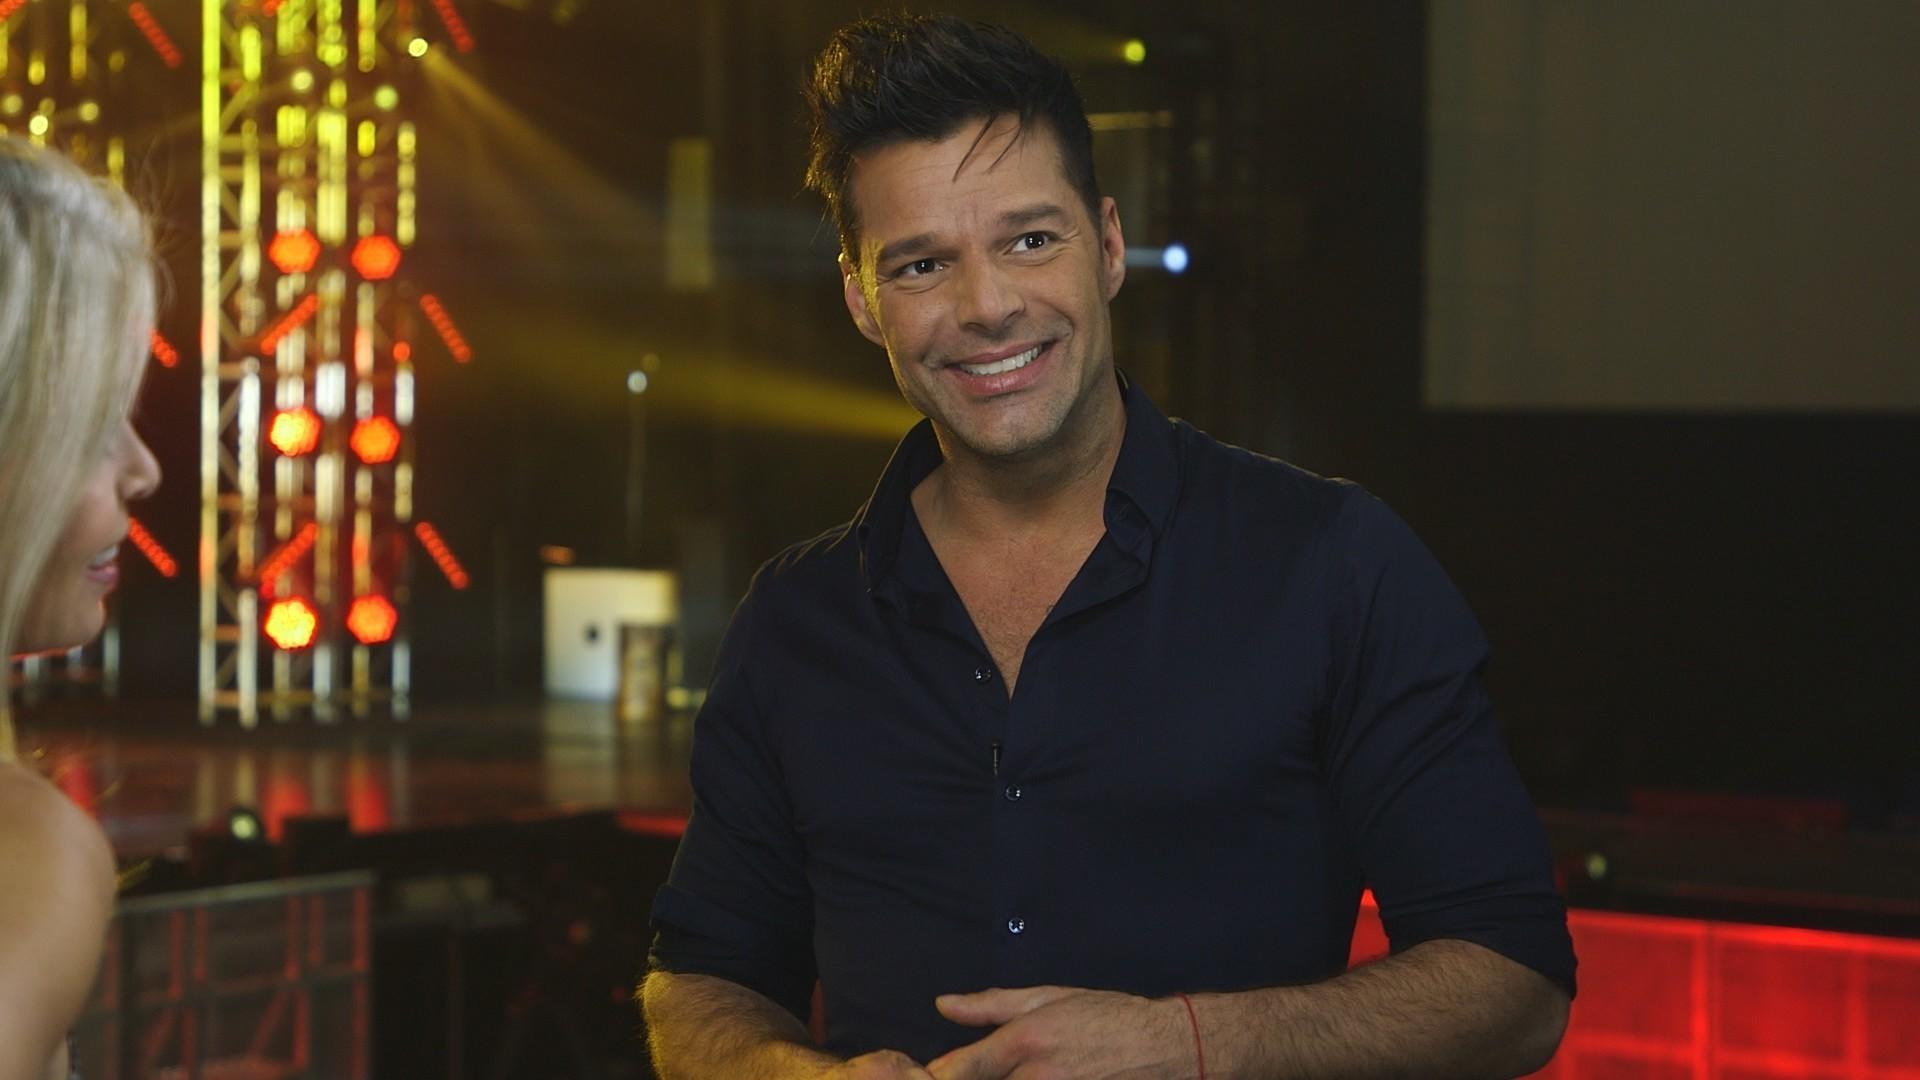 Ricky Martin CBS Sunday Morning | Entertainment News 2017 | Celebrity News 2017 | Celebrity Gossip